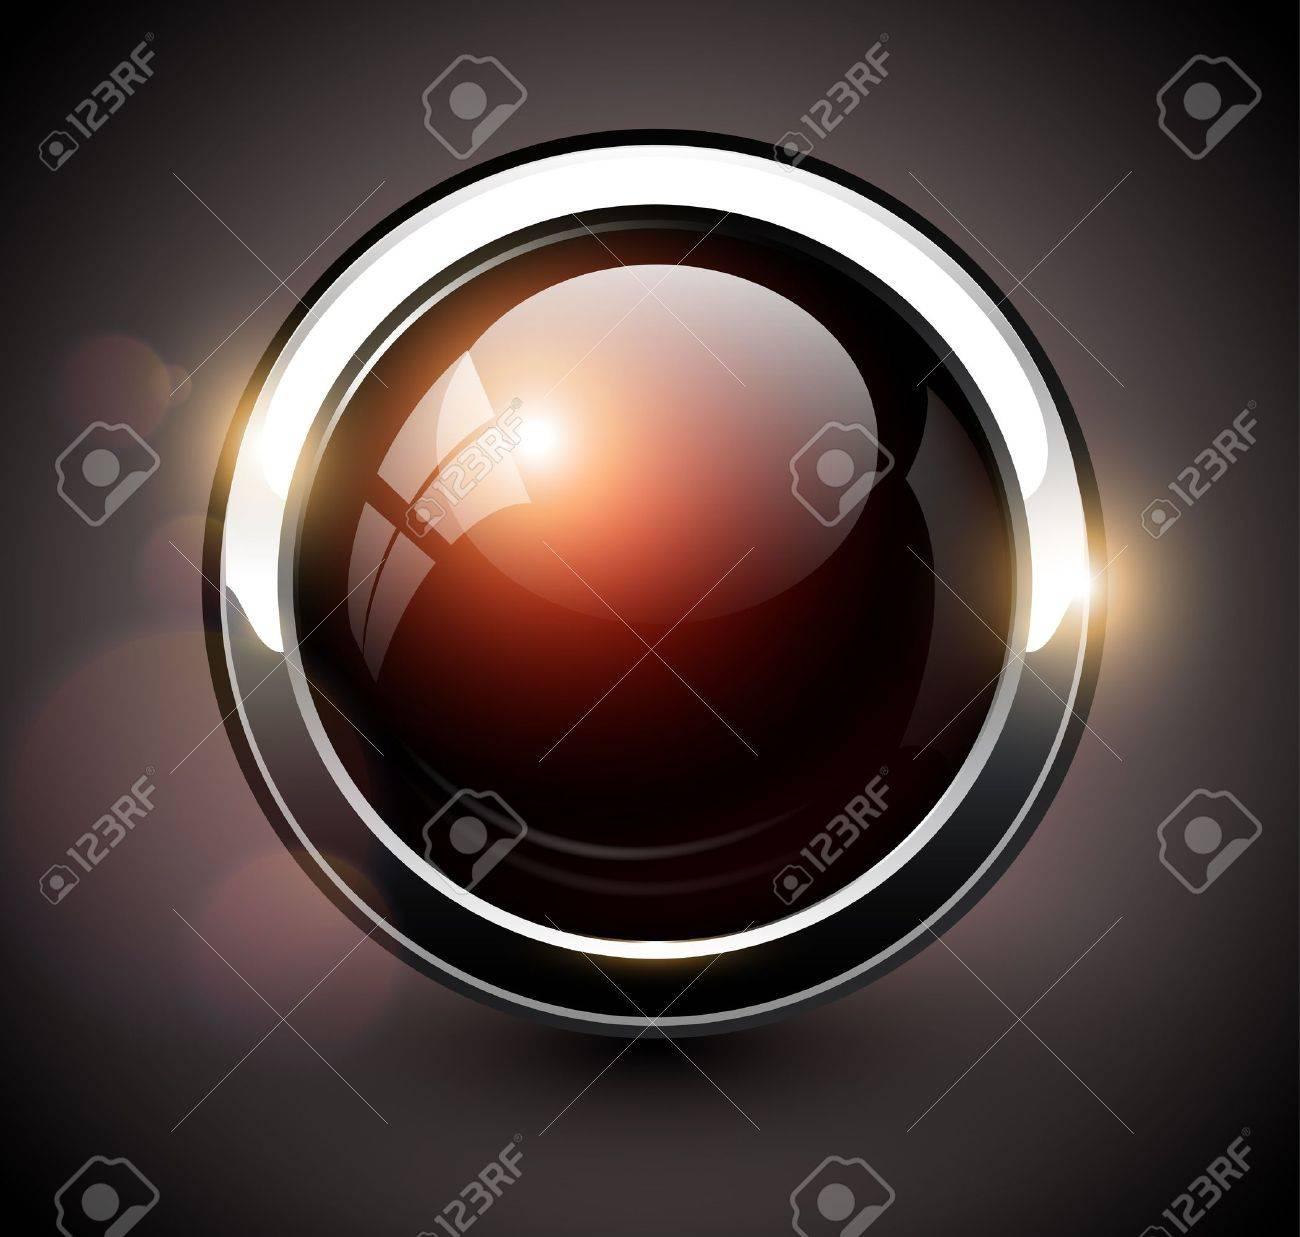 Elegant shiny button with metallic elements, vector design for website. Stock Vector - 17105978